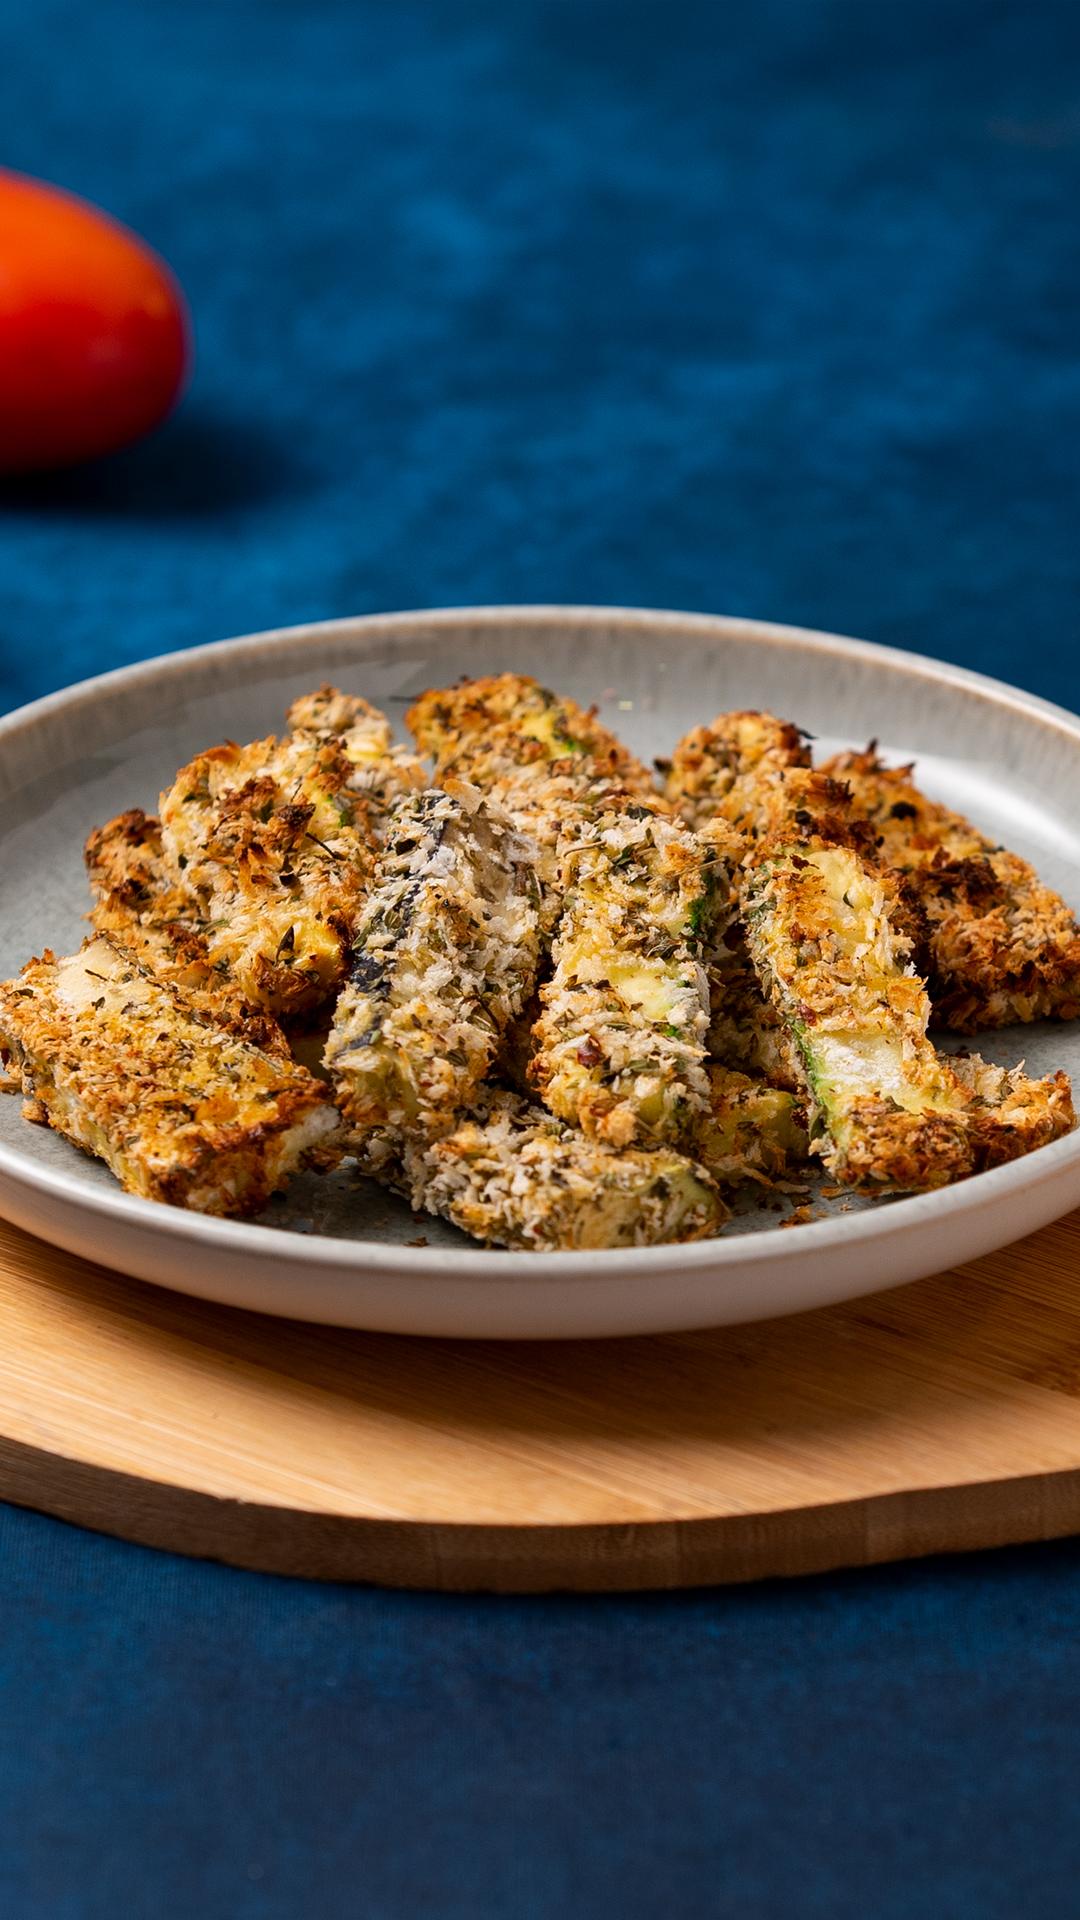 Baked Zucchini & Eggplant Fingers